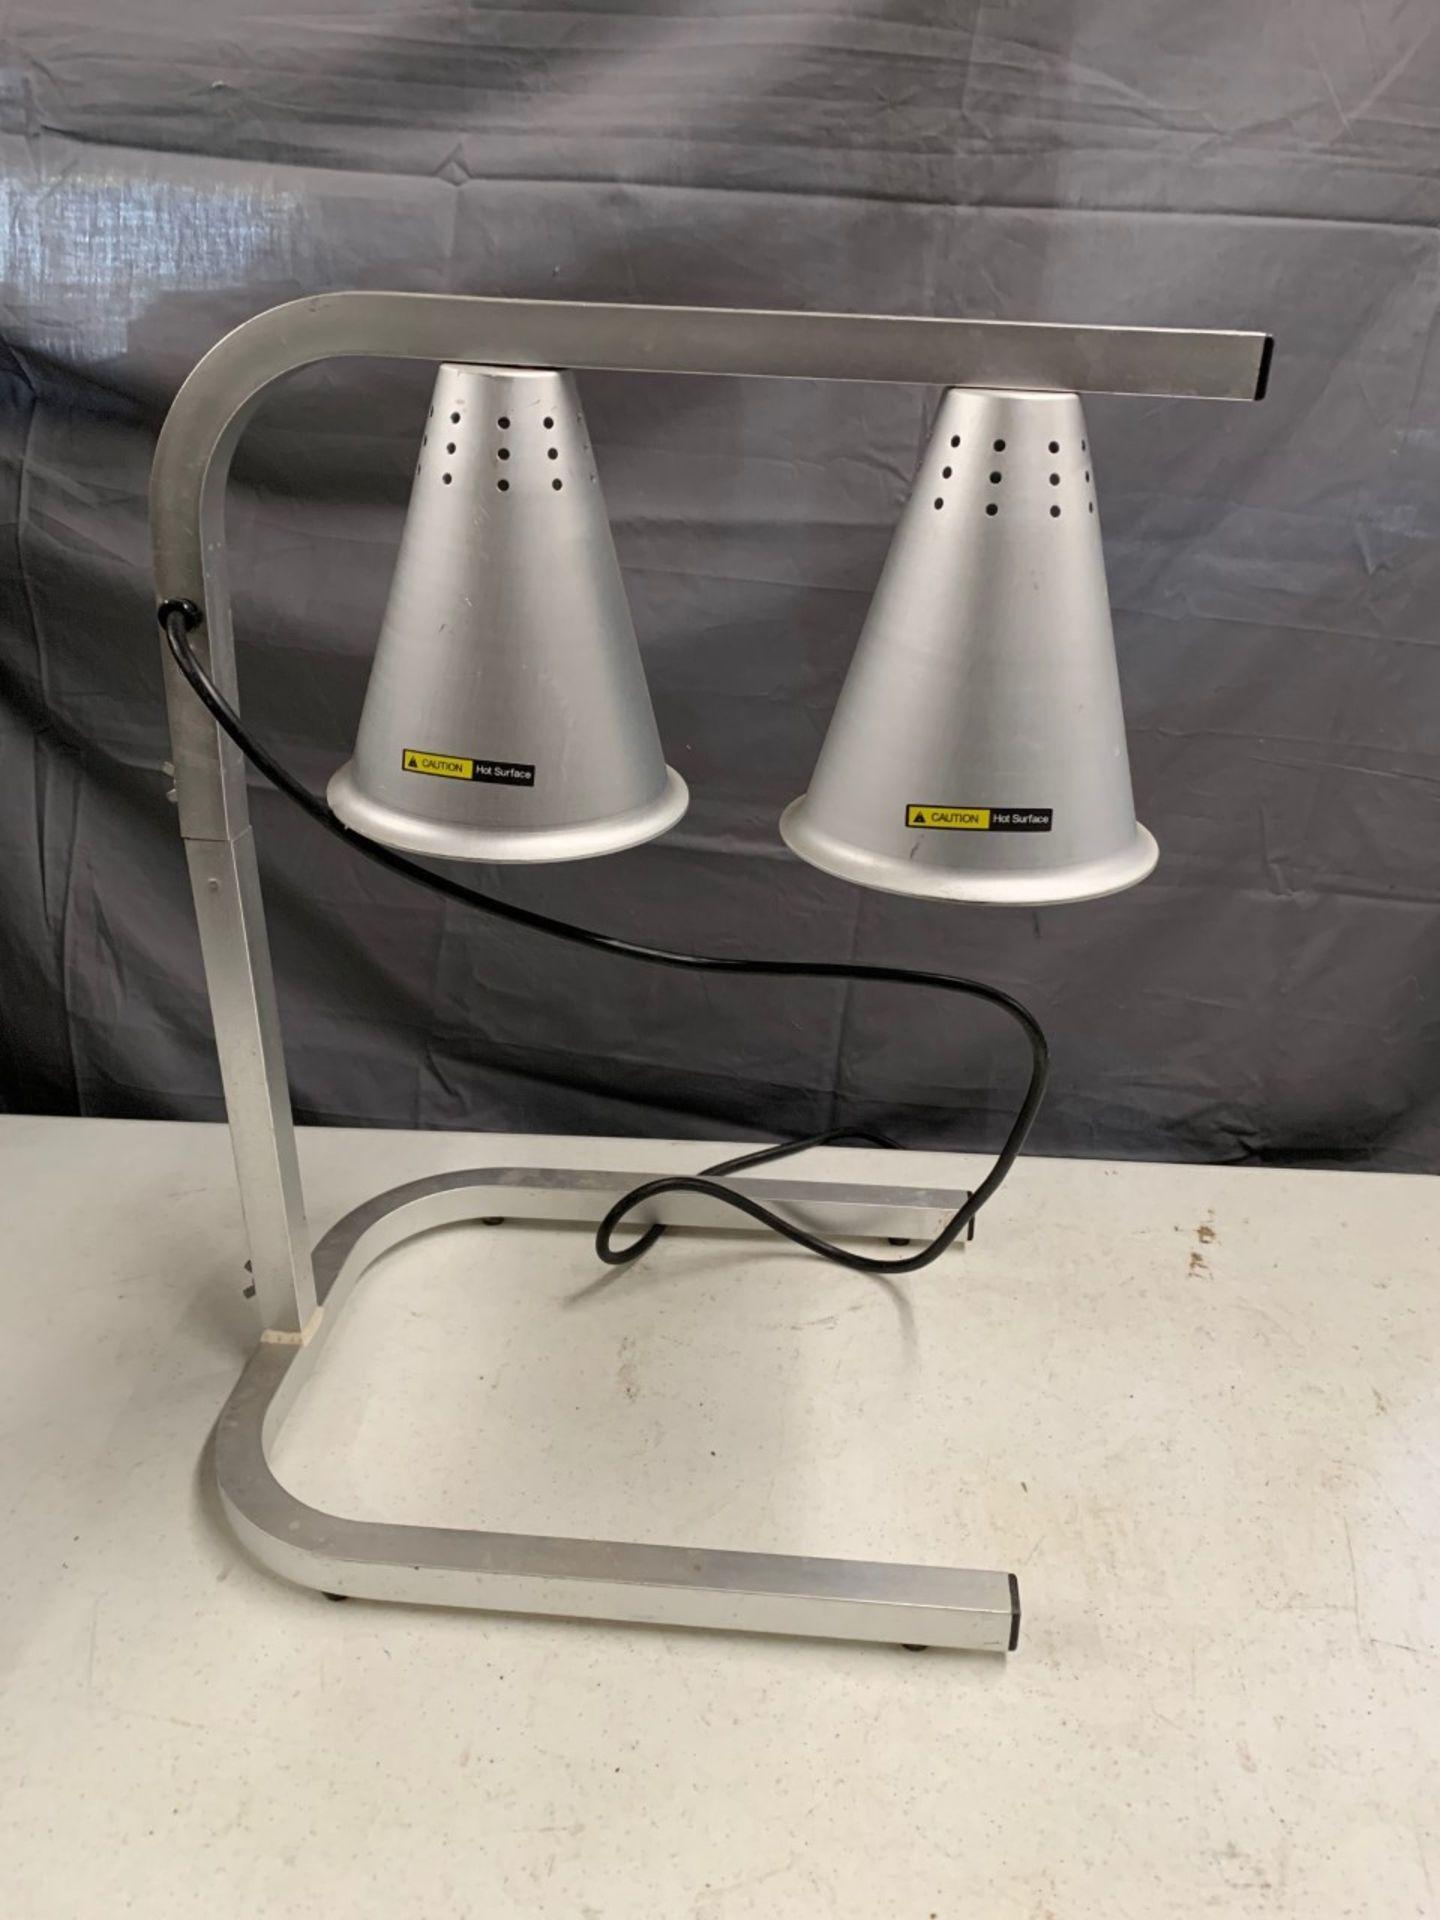 Lot 1457 - Table Top Heat Lamp, Adcraft